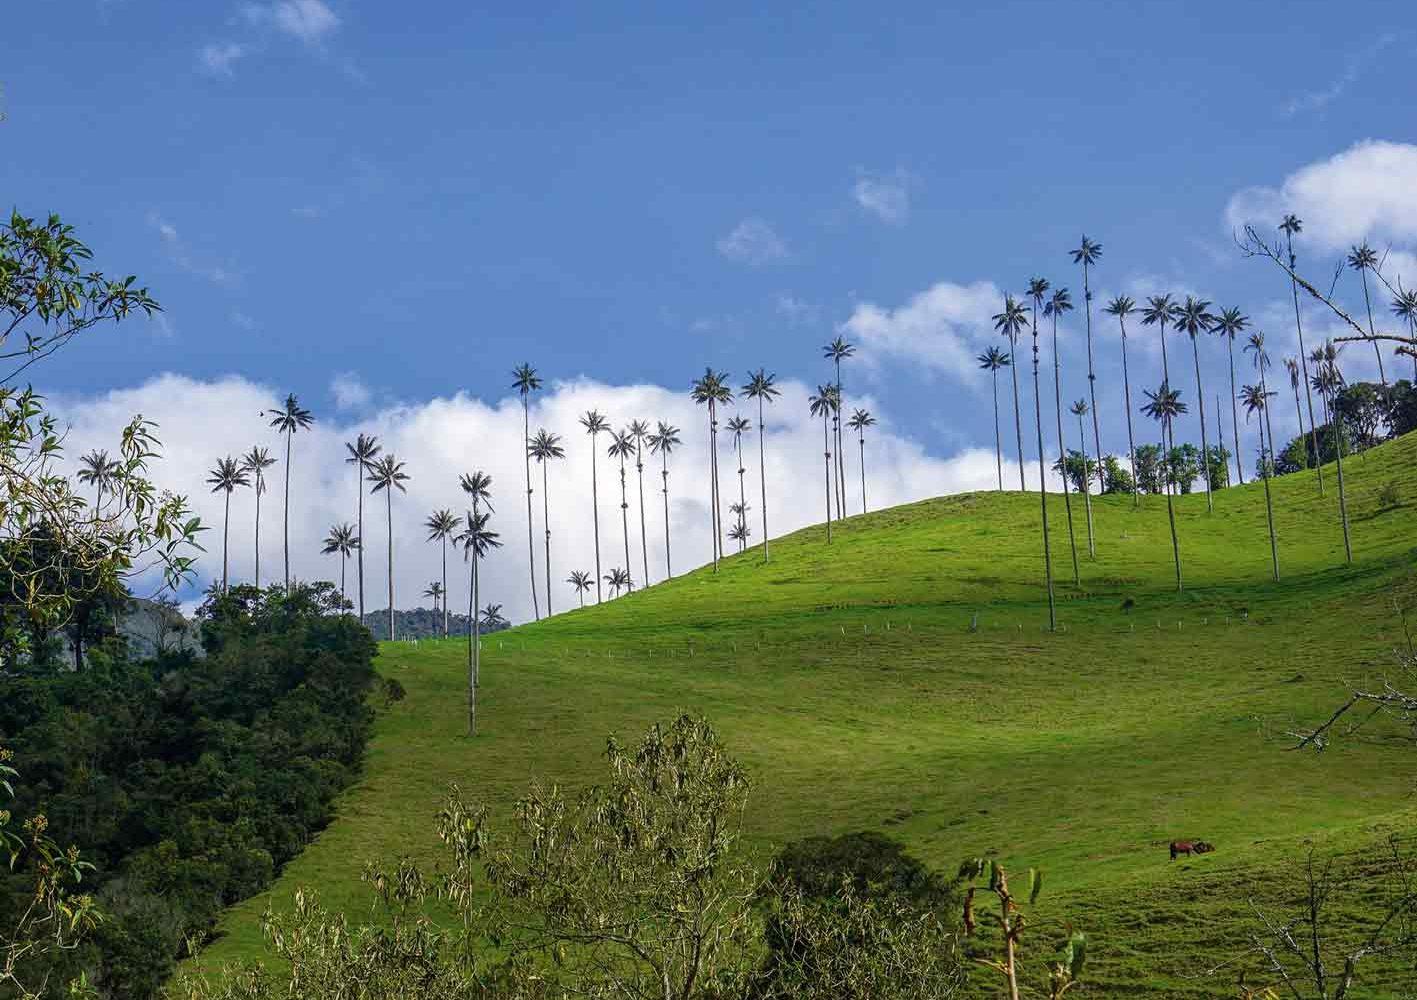 Wir wandern bei den Wachspalmen im Valle de Cocora, Kolumbien